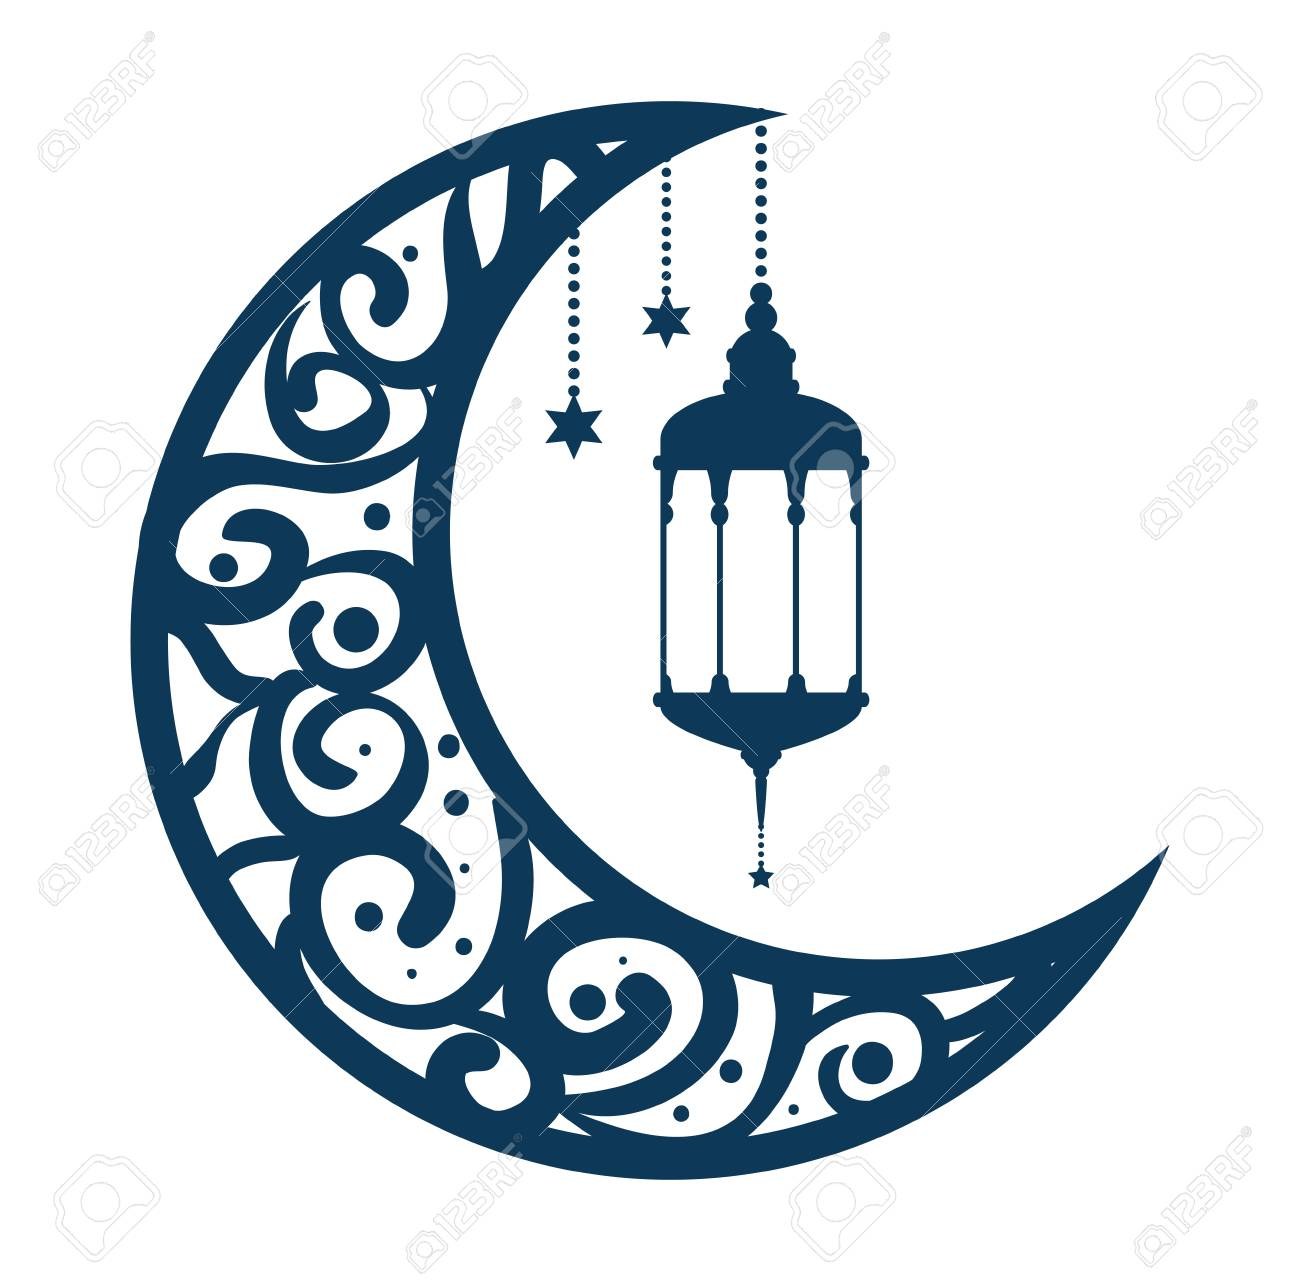 ramadan kareem moon with lamps hanging vector illustration design - 102029899